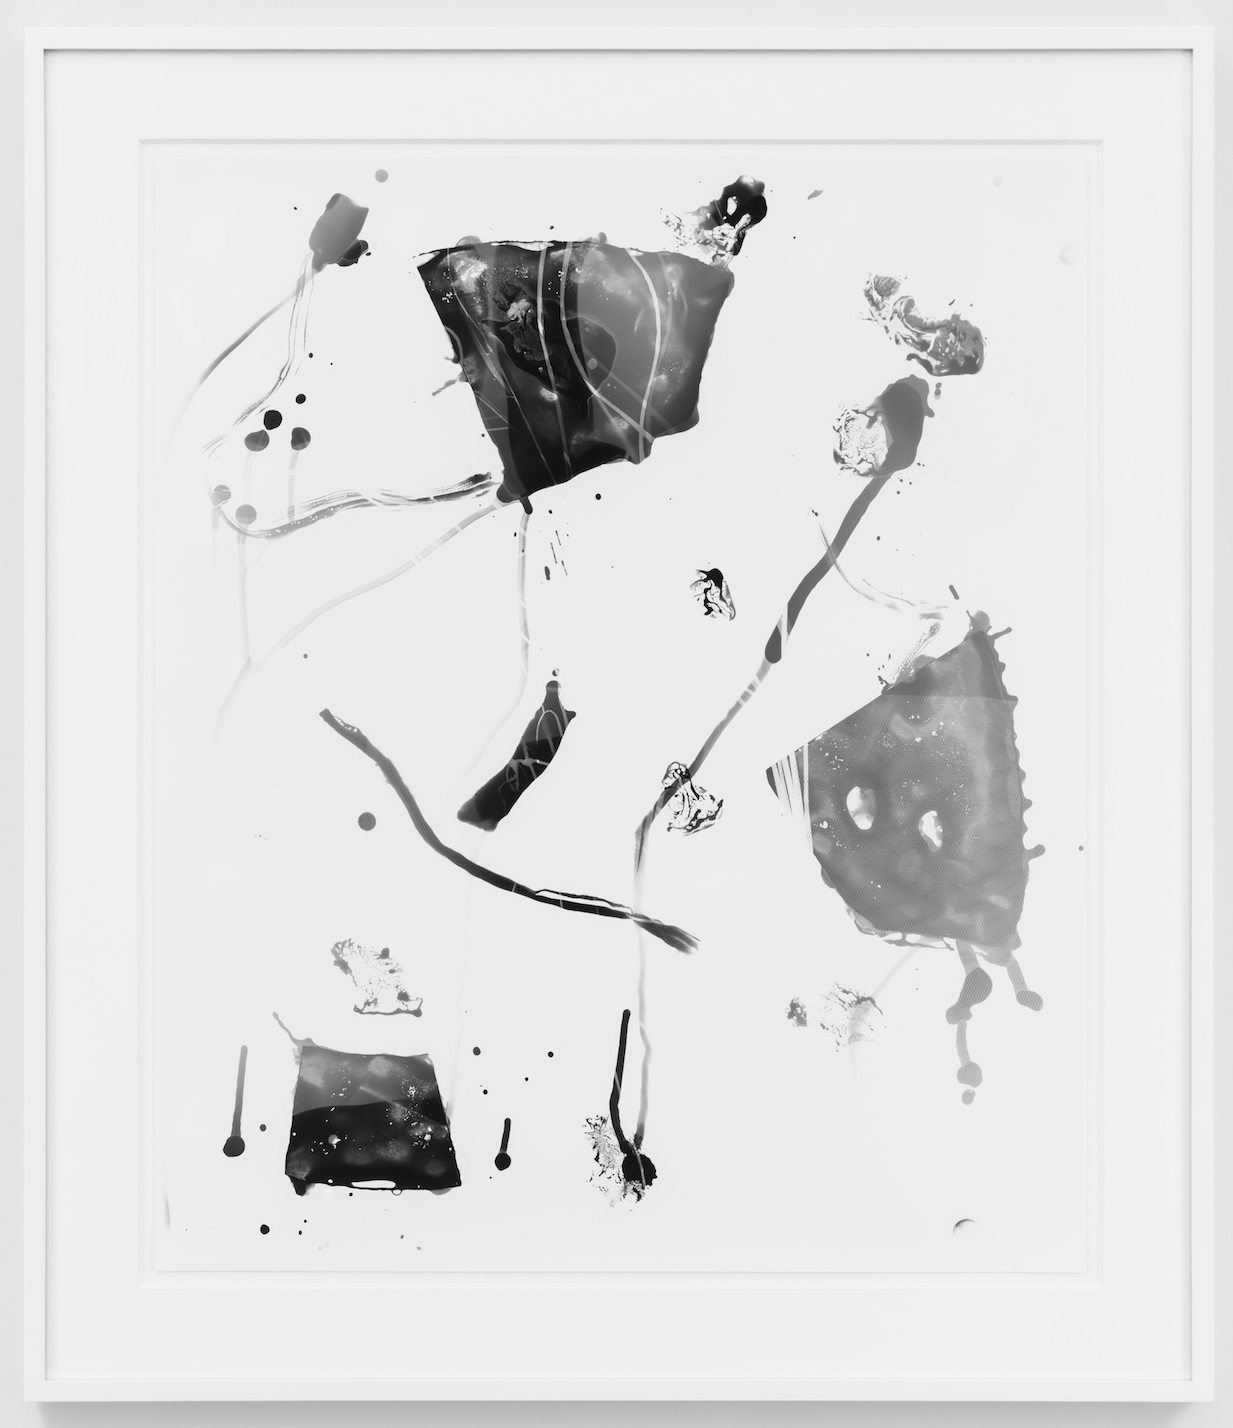 Untitled  2013  Unique silver gelatin print  61 x 50.8 cm / 24 x 20 in,74.5 x 64.3 cm / 29.5 x 27.3 in framed